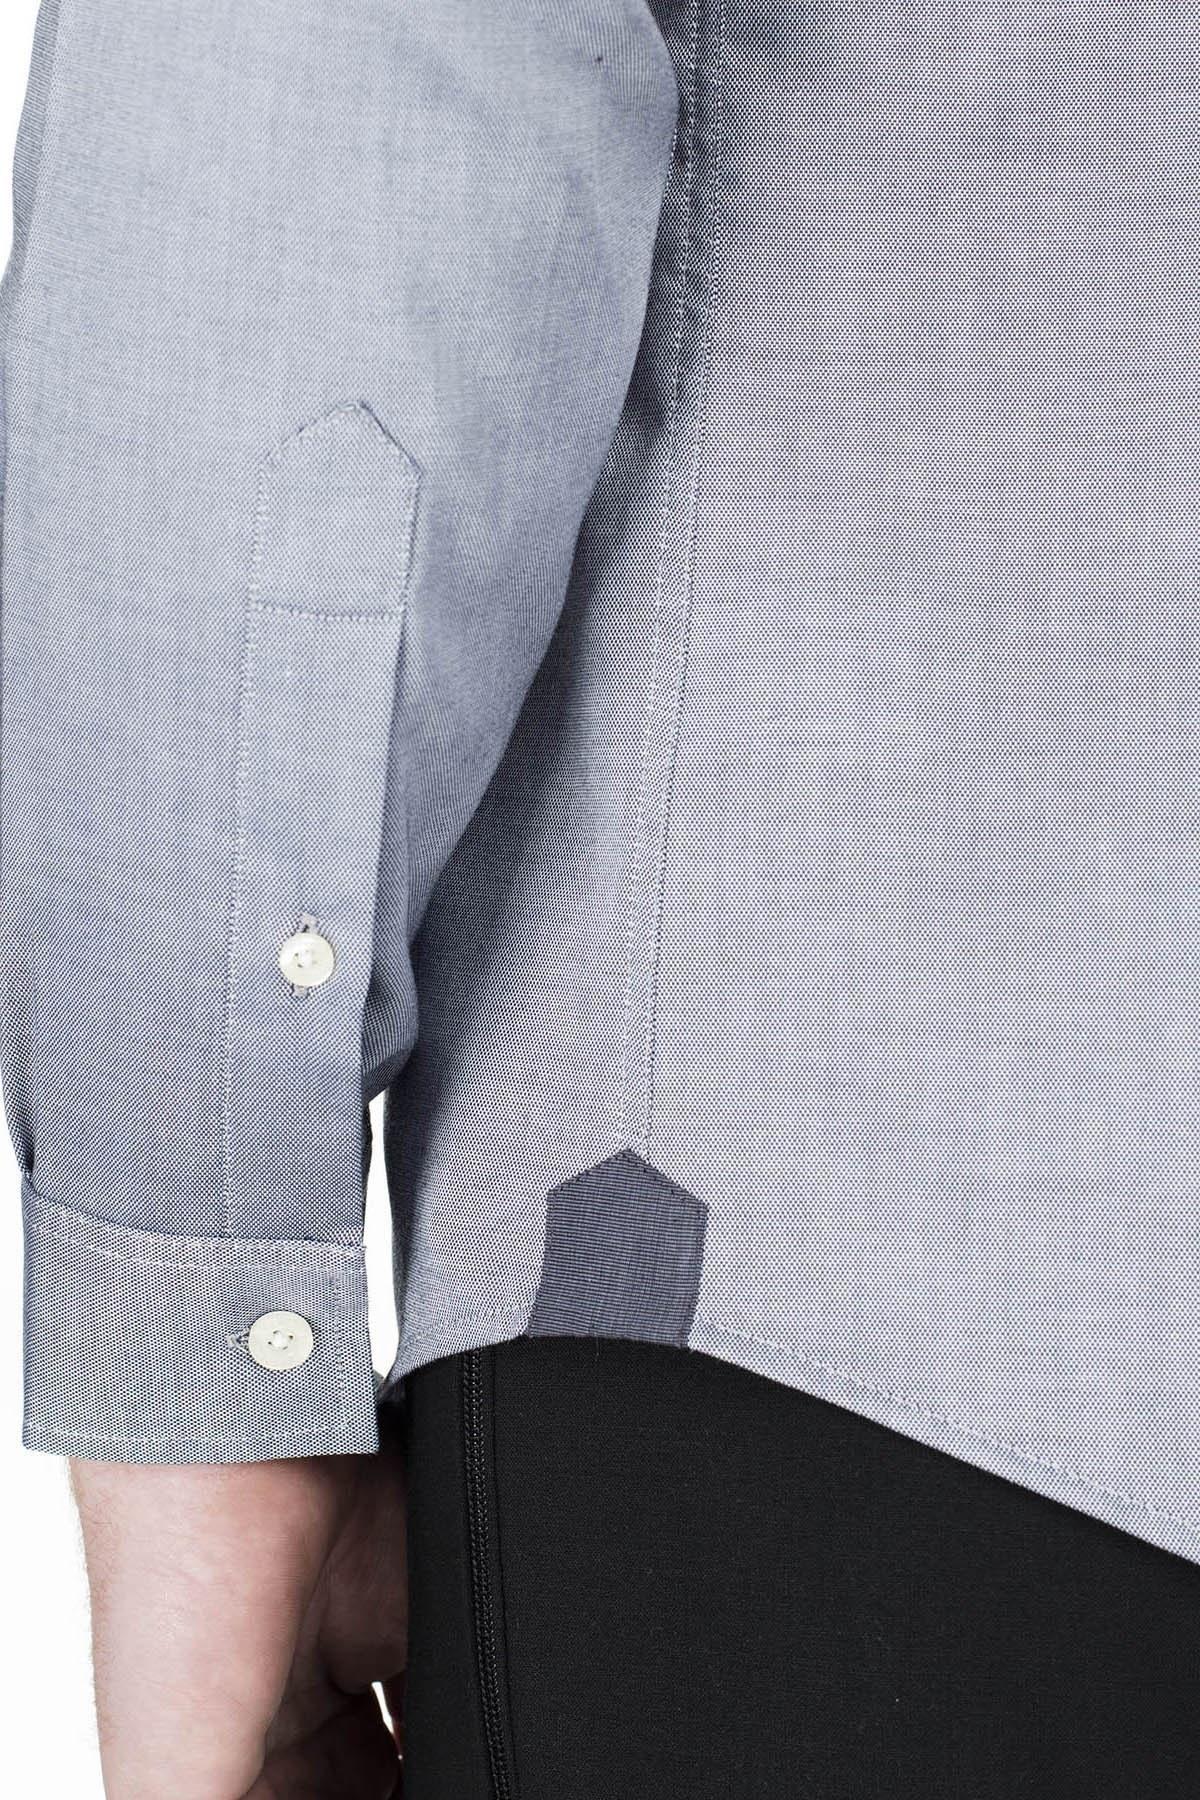 Lacoste Slim Fit Erkek Gömlek CH4976 423 LACİVERT